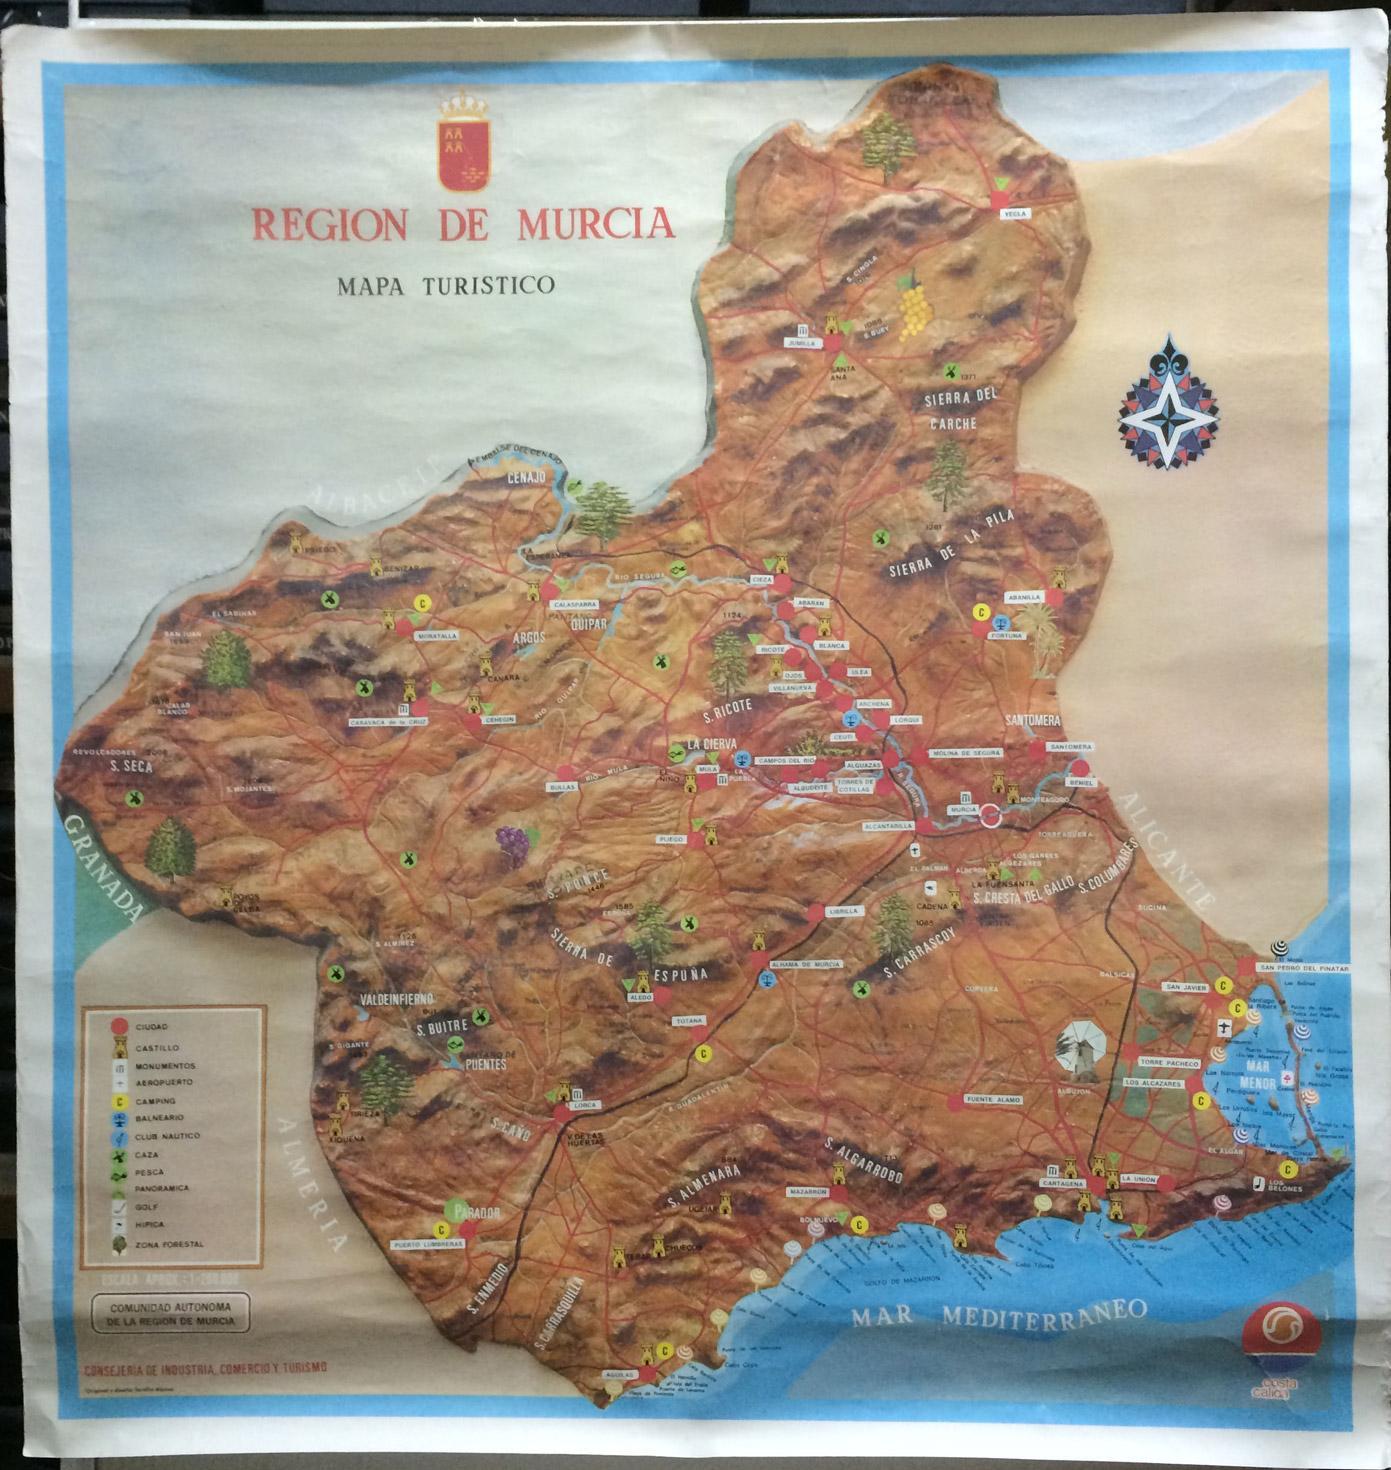 Mapa Region De Murcia.Cartel Region De Murcia Mapa Turistico